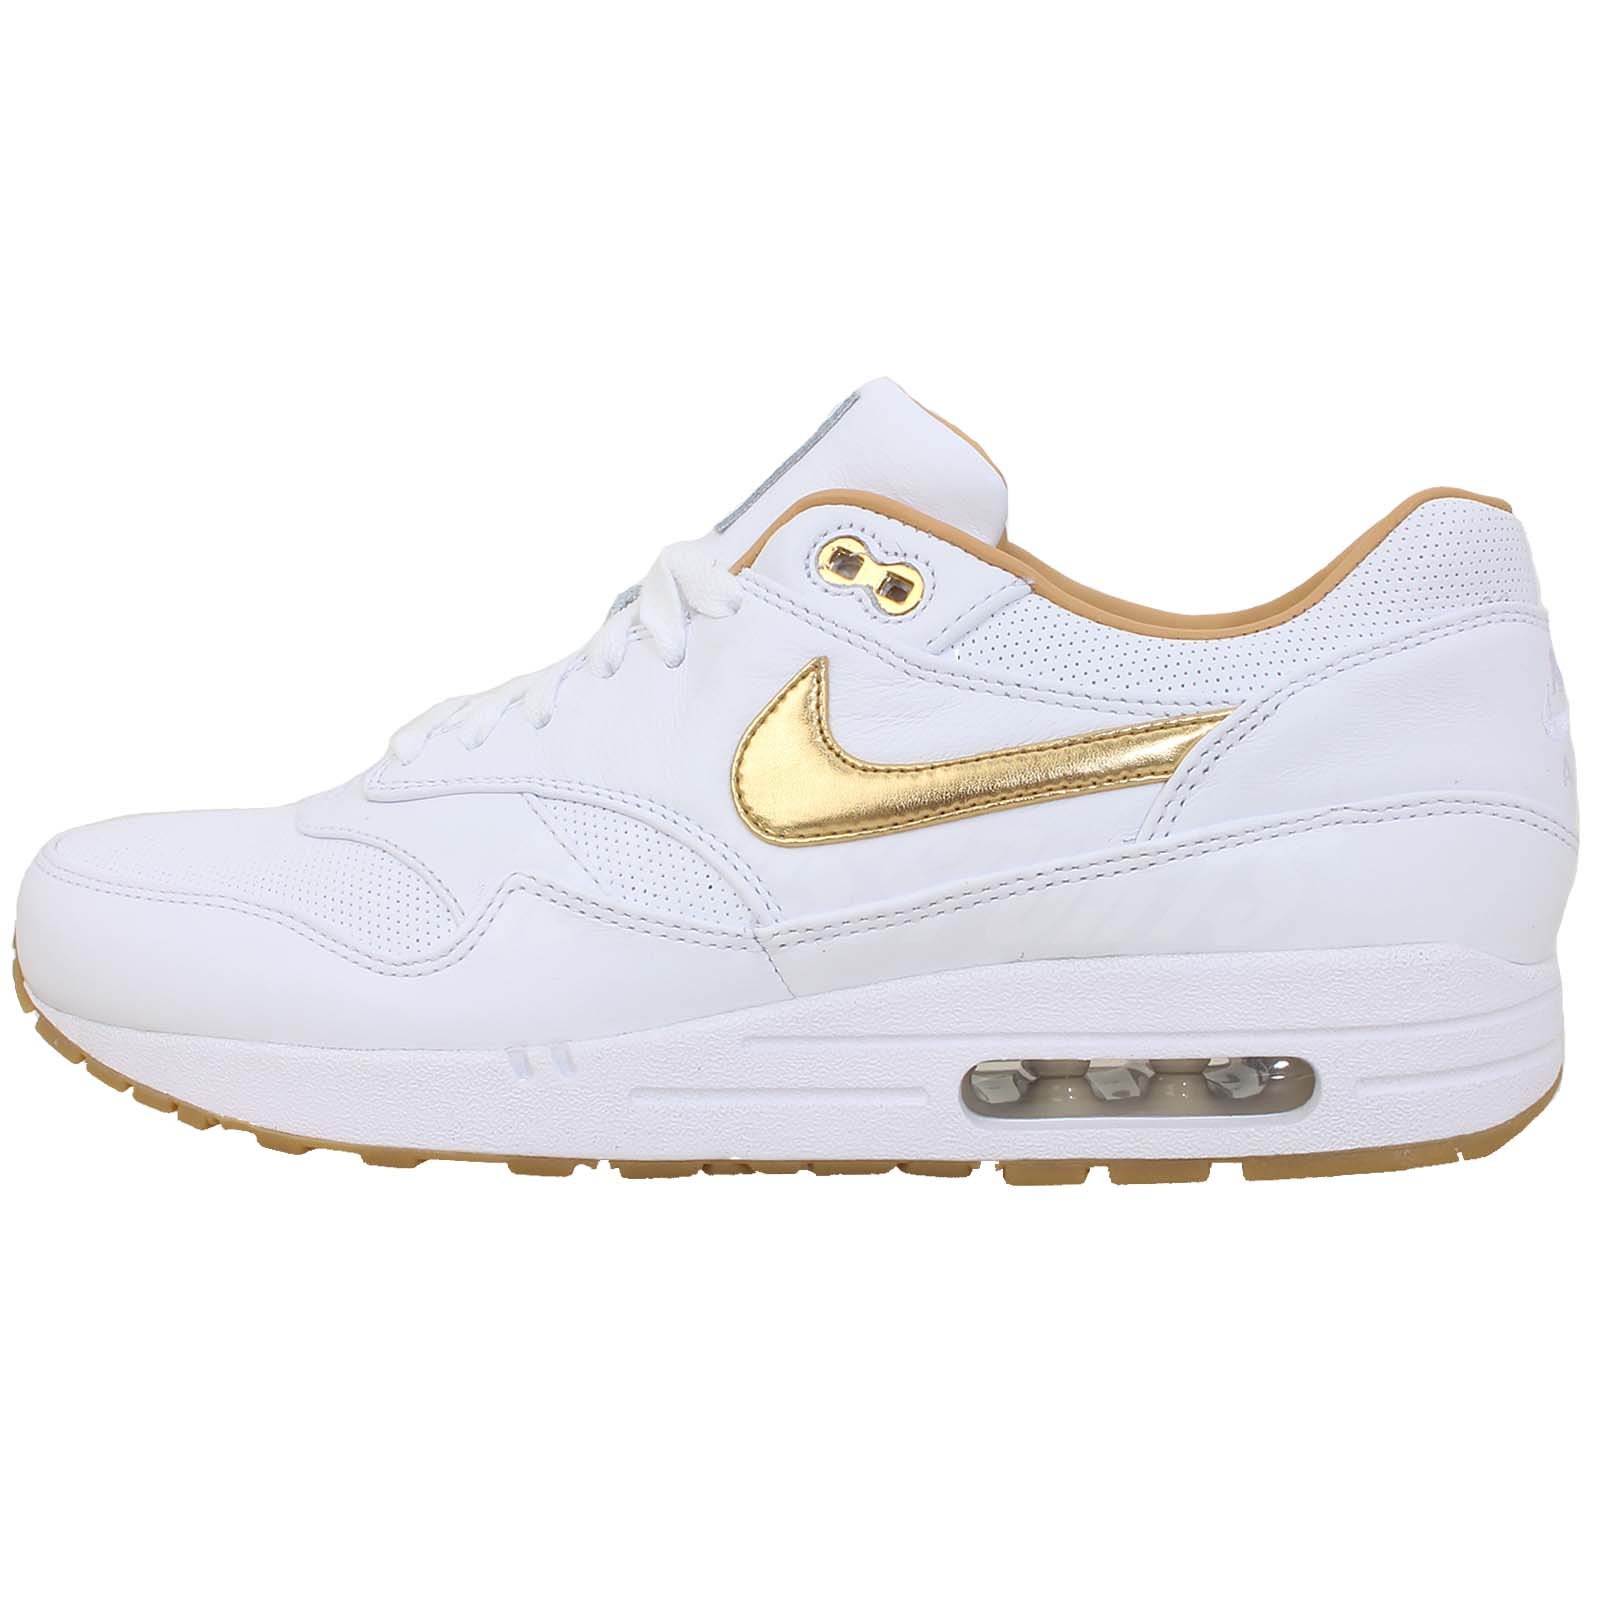 Nike Air Max 90 White Gold lanarkunitedfc.co.uk